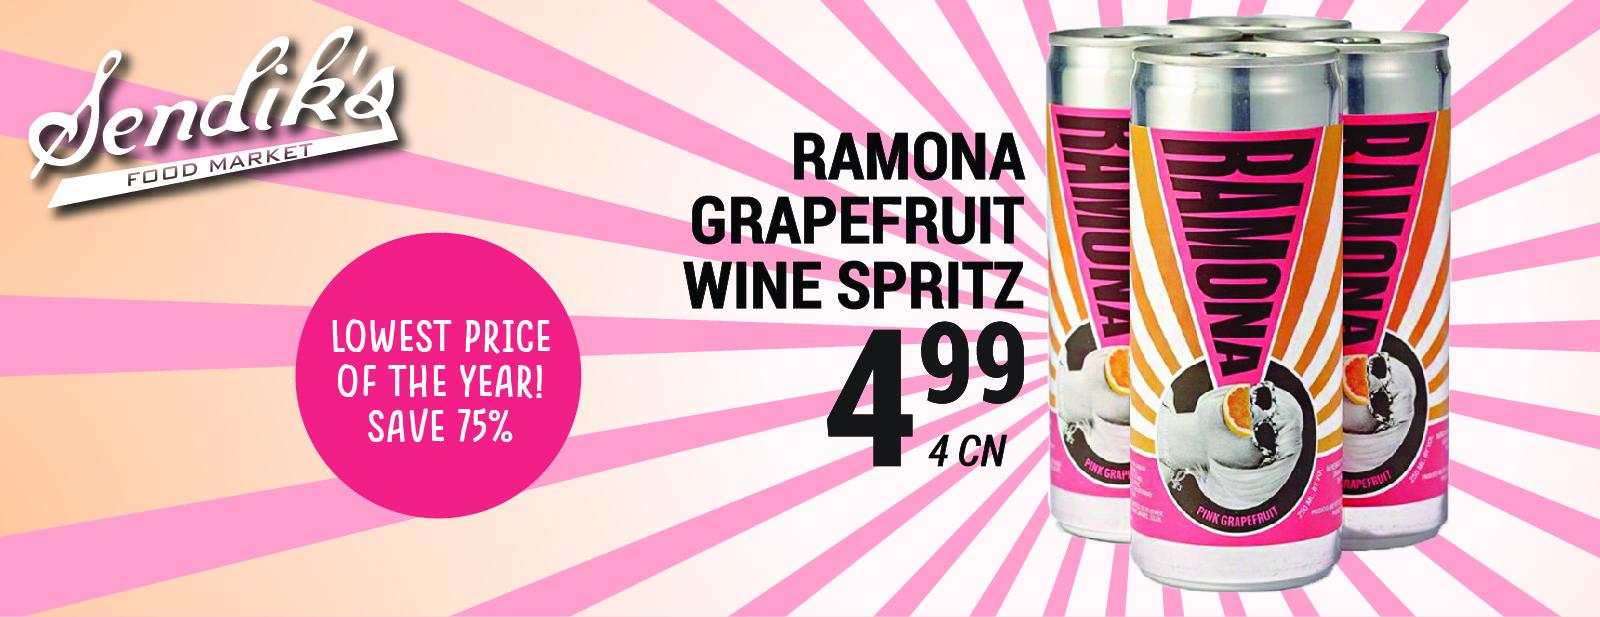 Ramona Grapefruit Wine Spritz $4.99 4 can